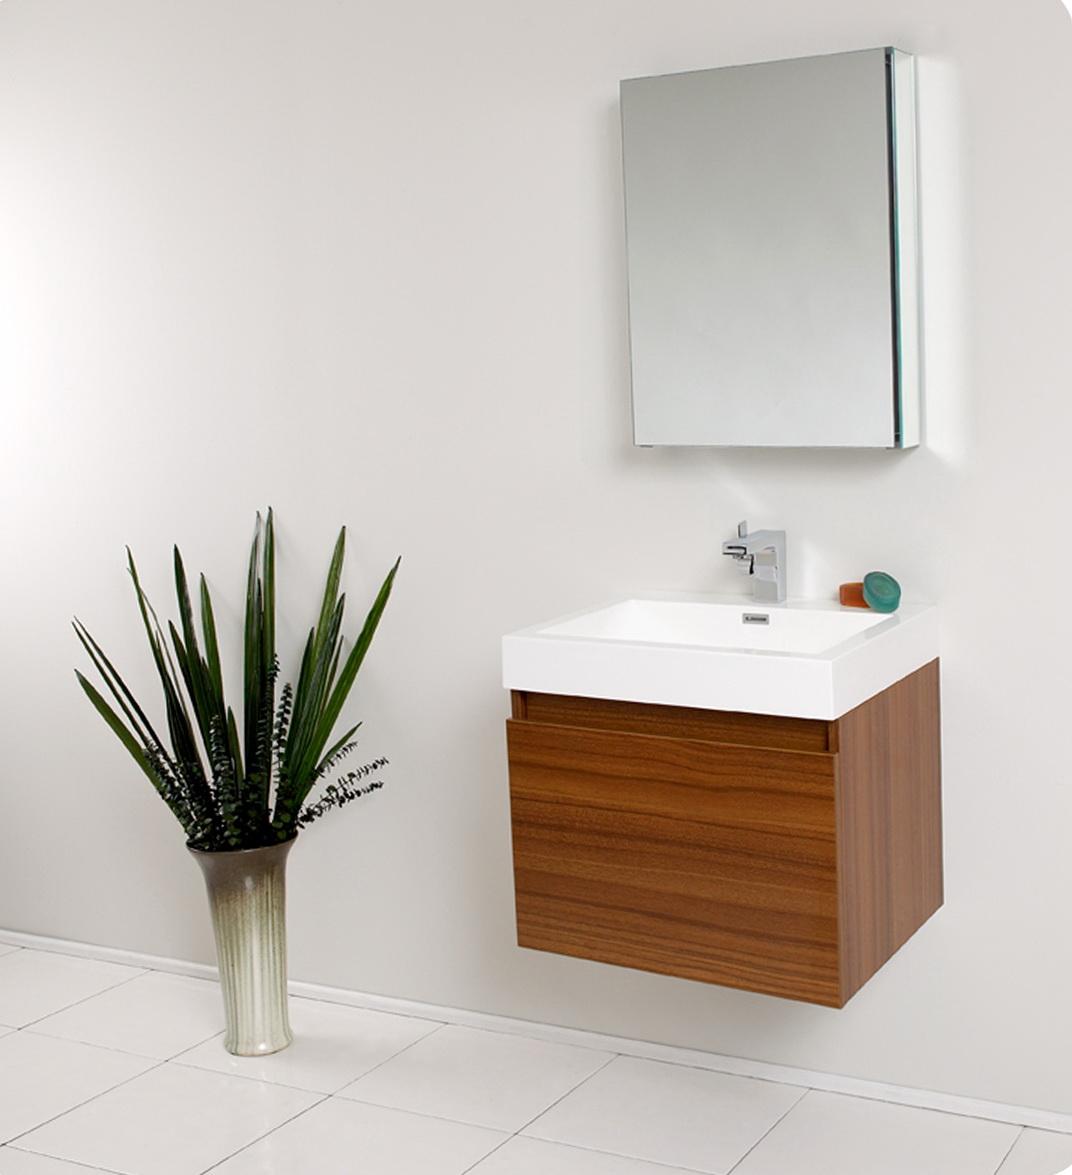 Teak Bathroom Vanity Cabinets